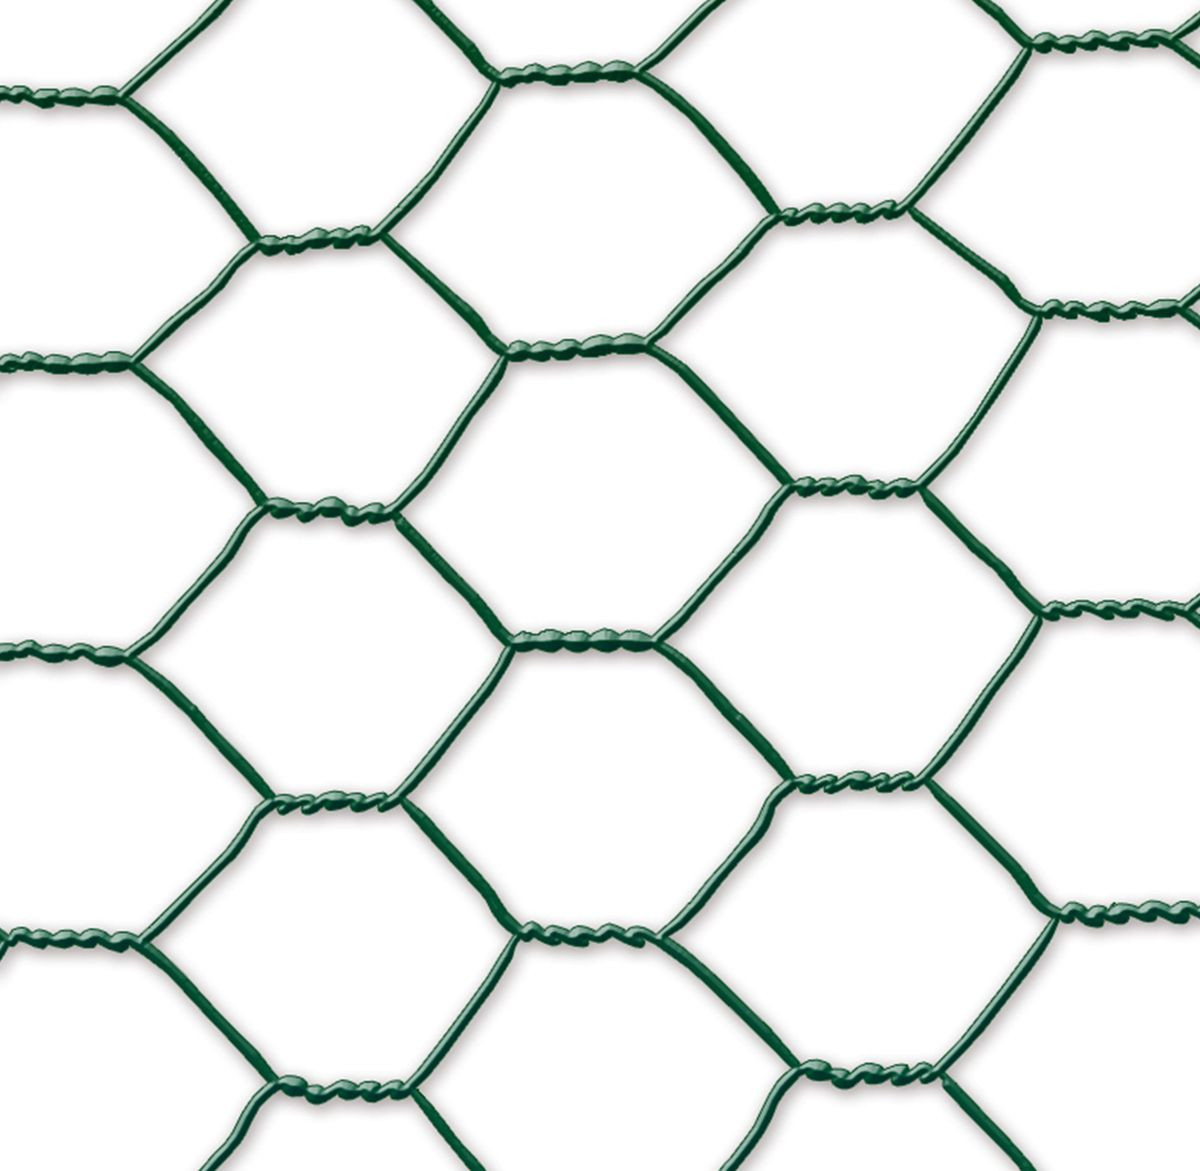 Grillage métal plastifié - 0,50 x 10 m/41 x 0,8 mm \